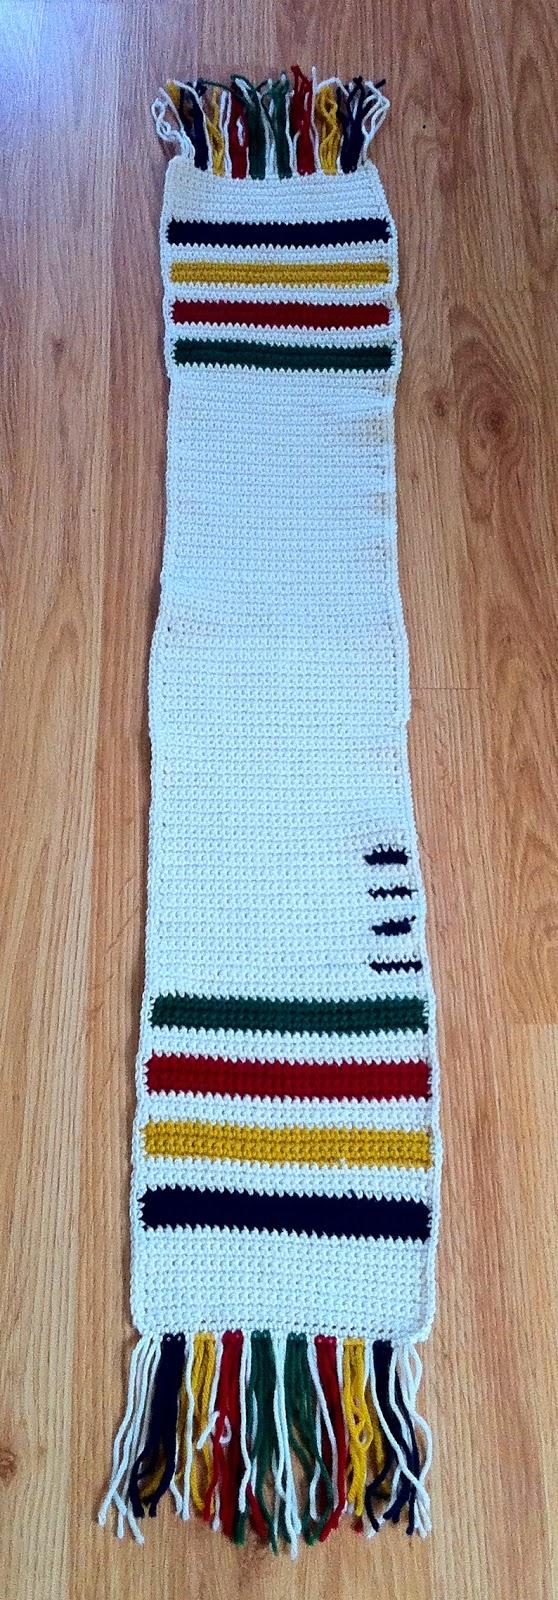 Hudson Bay Blanket Knitting Pattern : Hudsons Bay Blanket Crochet Scarf The Way I Crochet